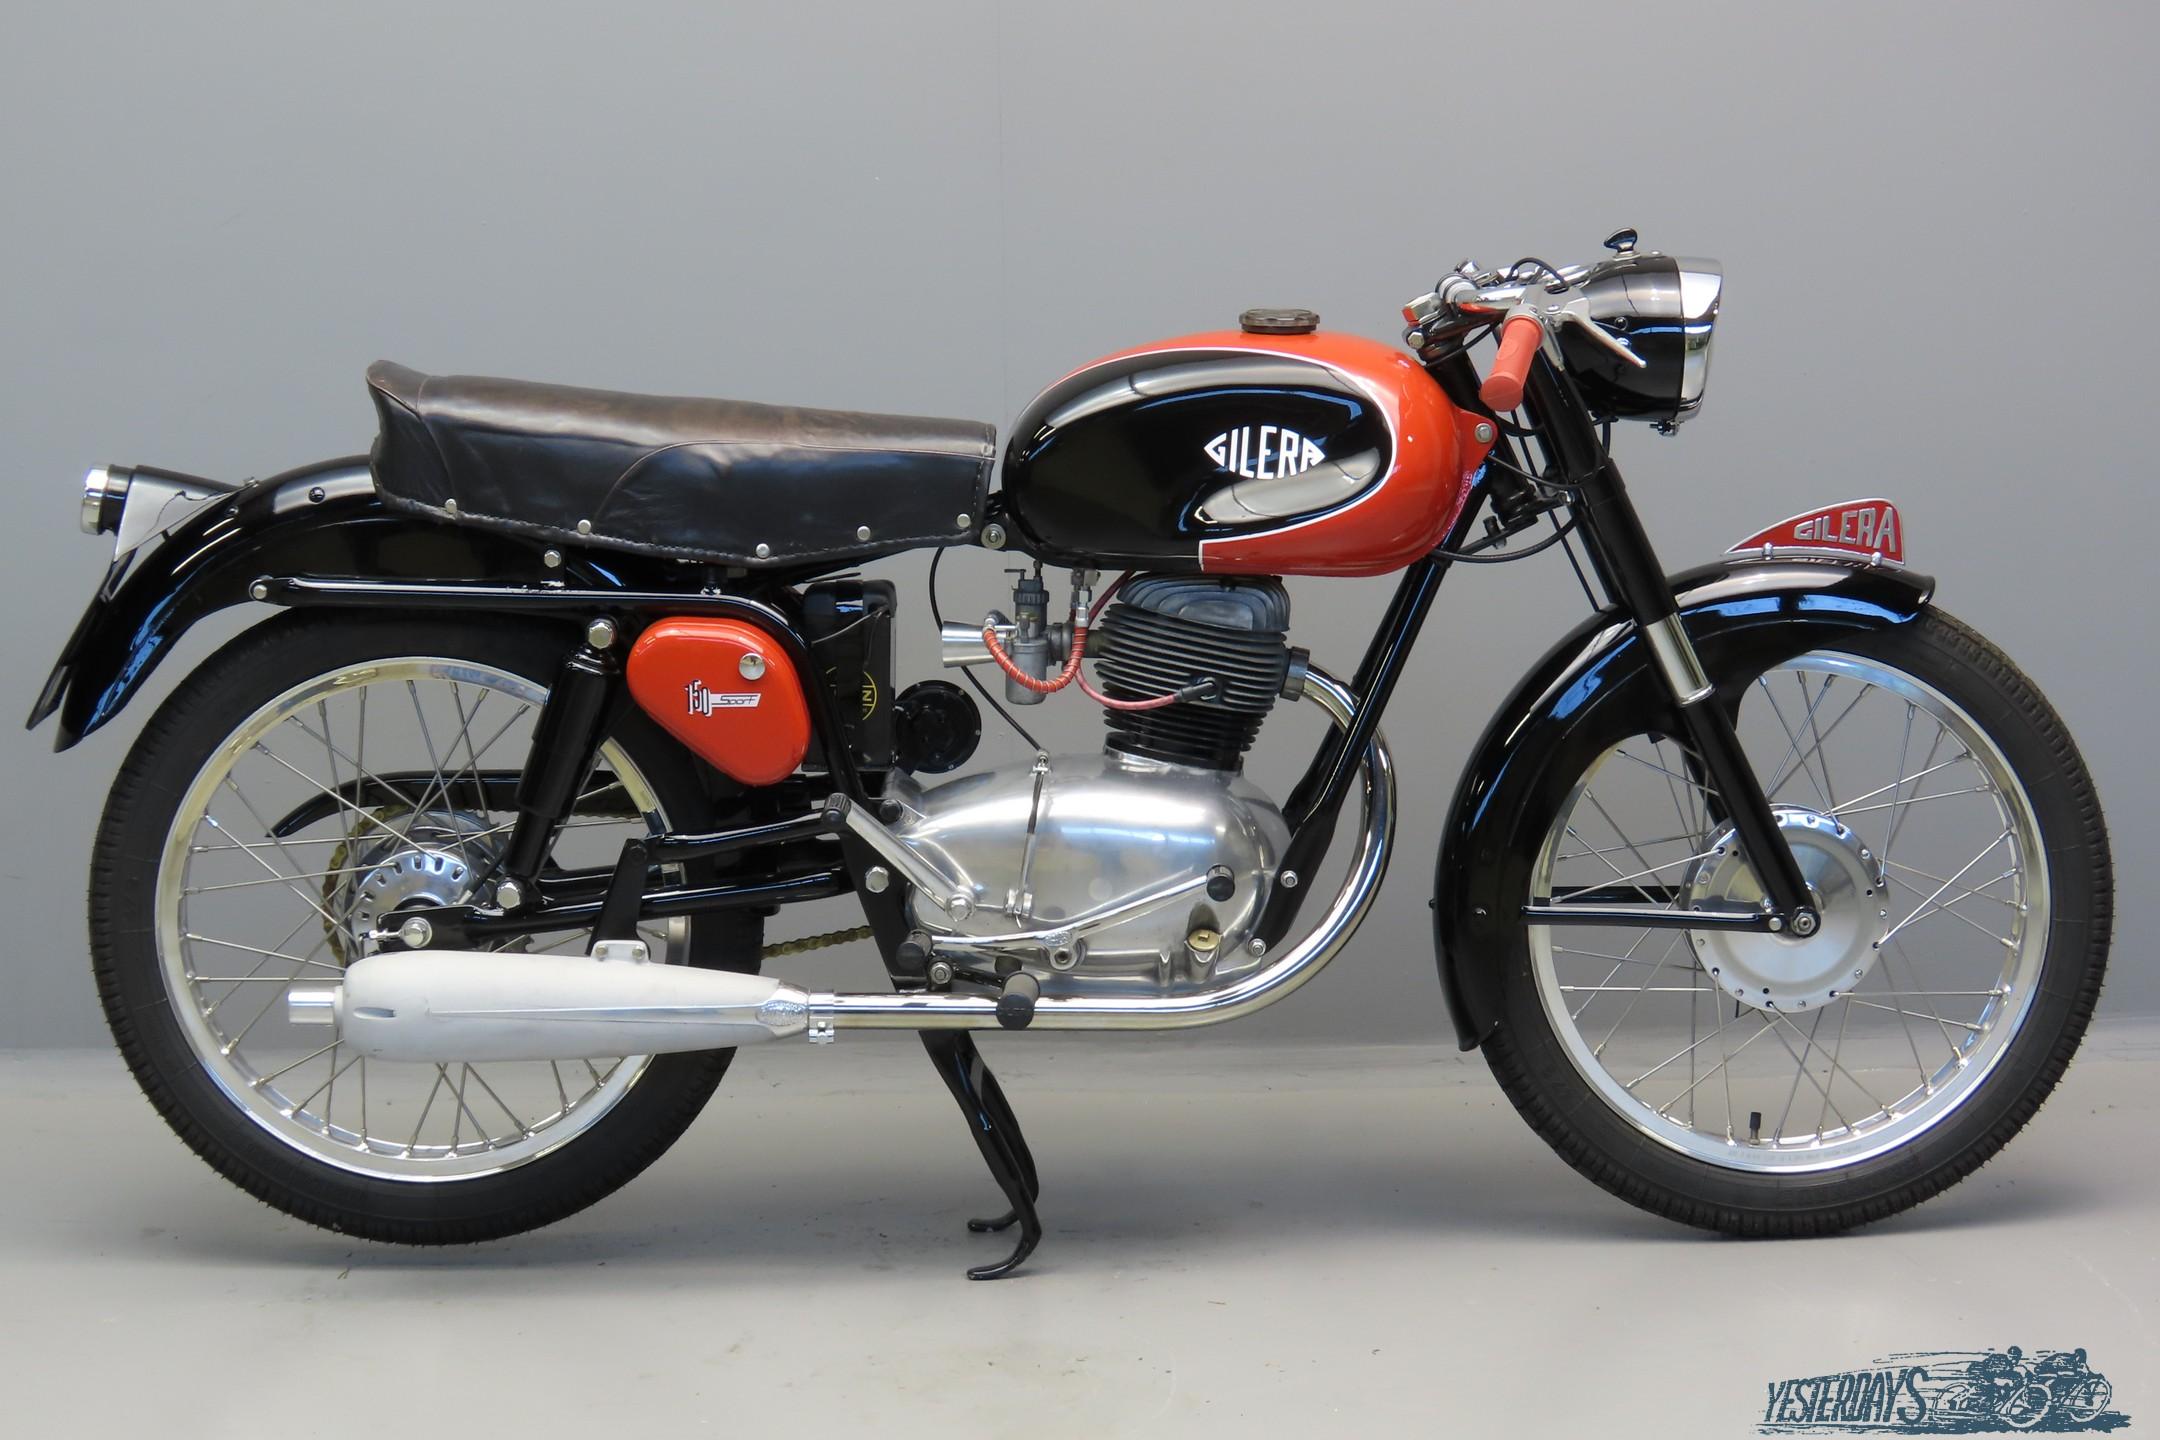 Gilera 1955 Supersport 150cc 1 cyl ohv  3007